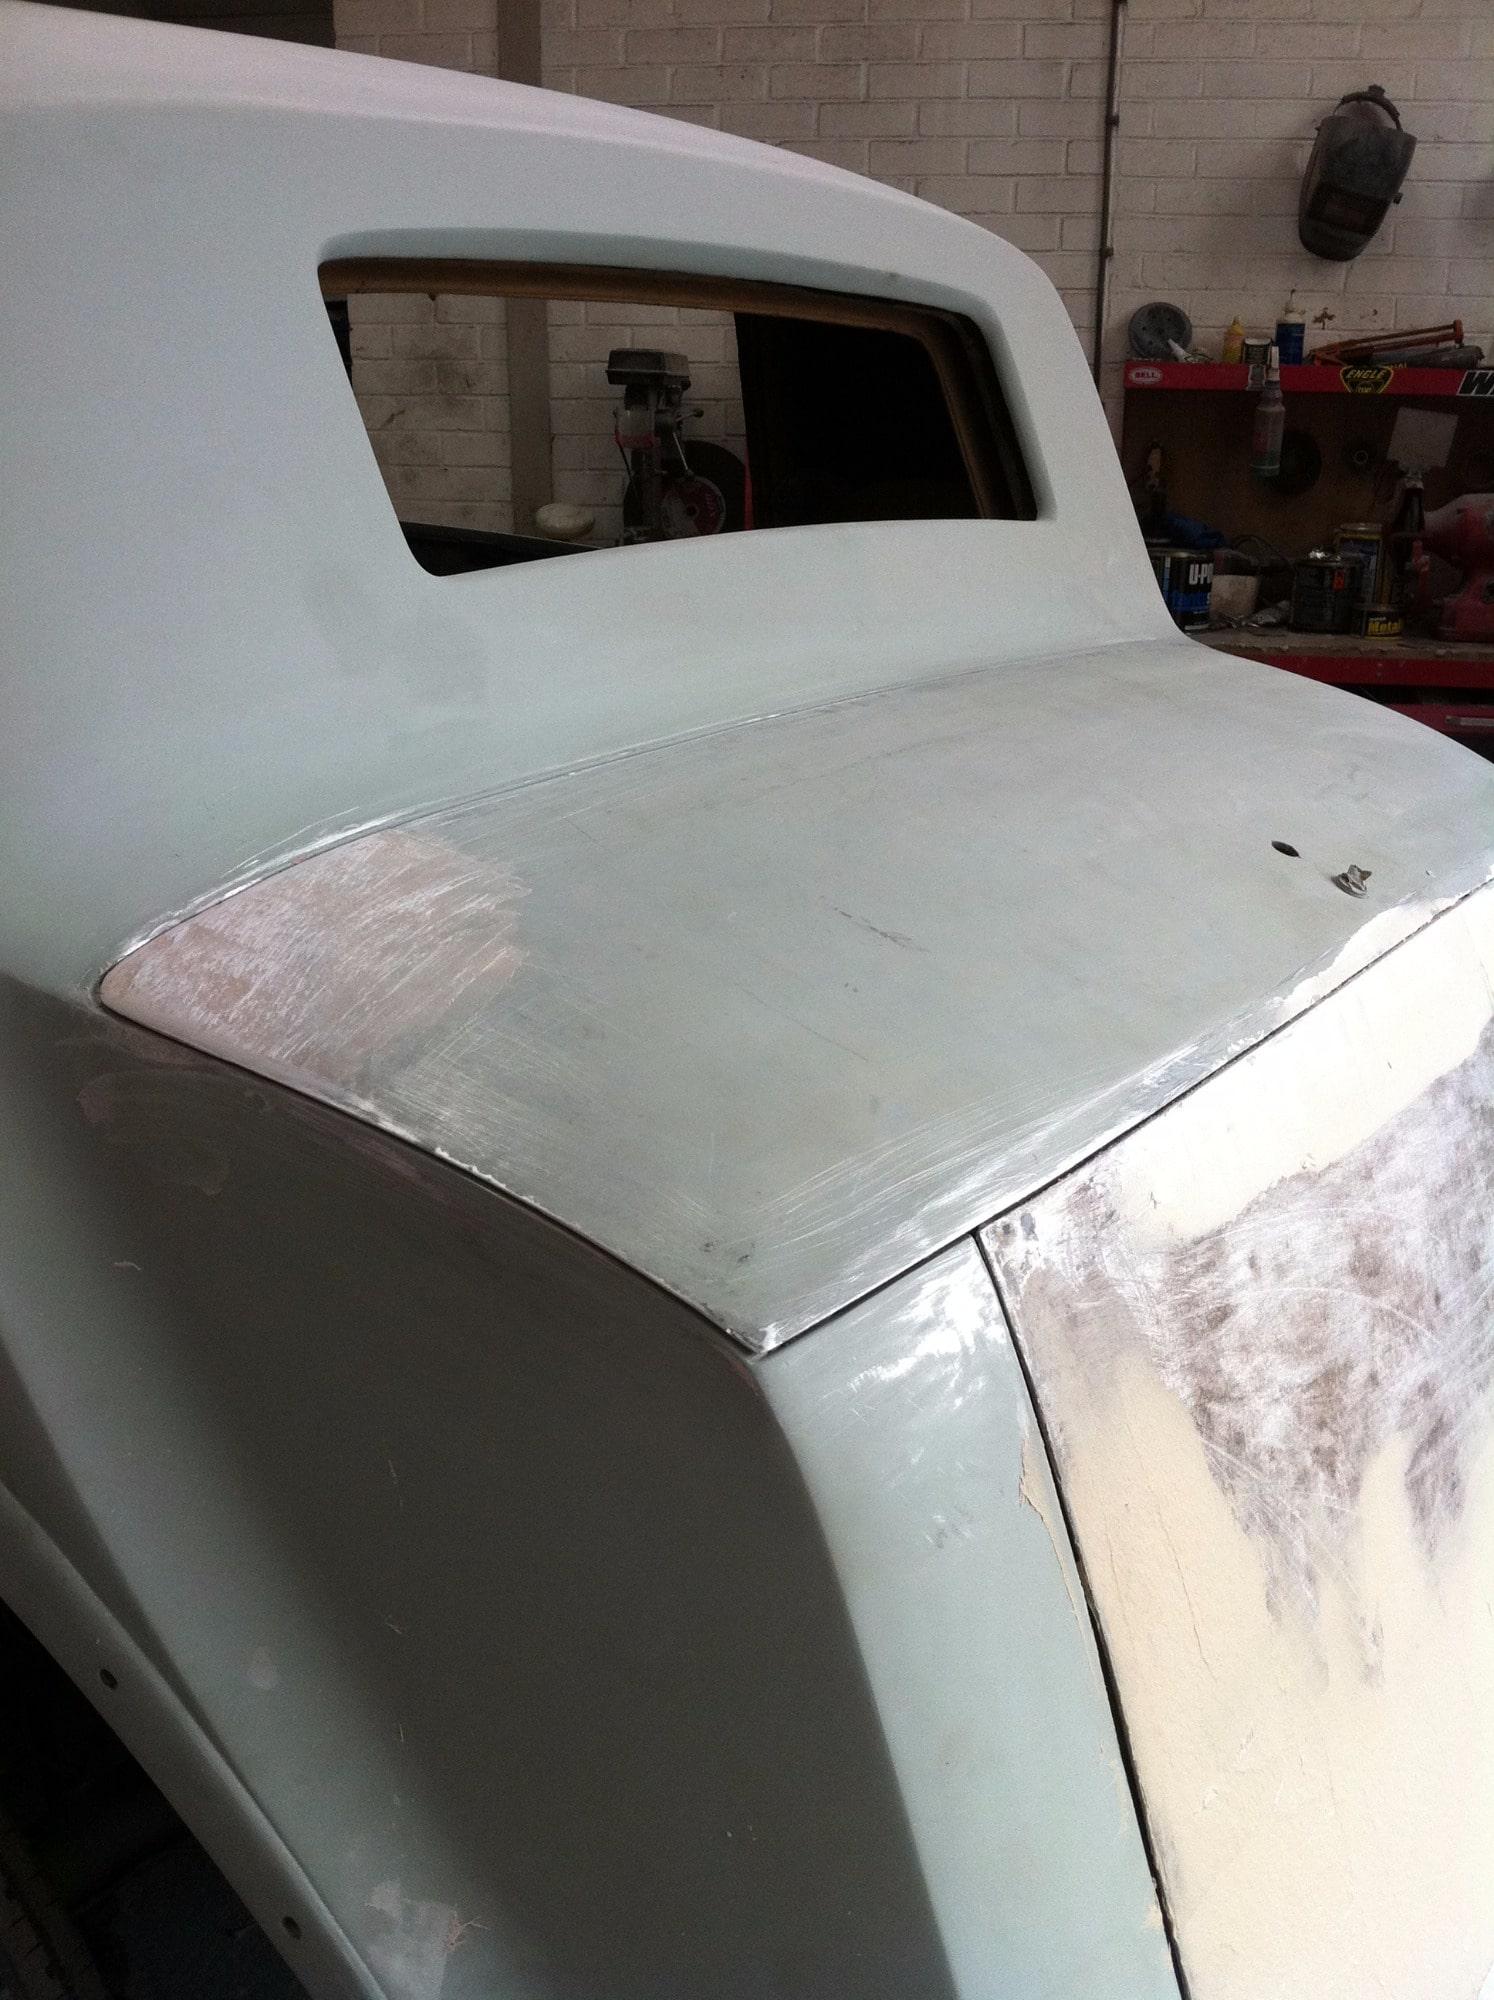 Rolls Royce stripped vehicle